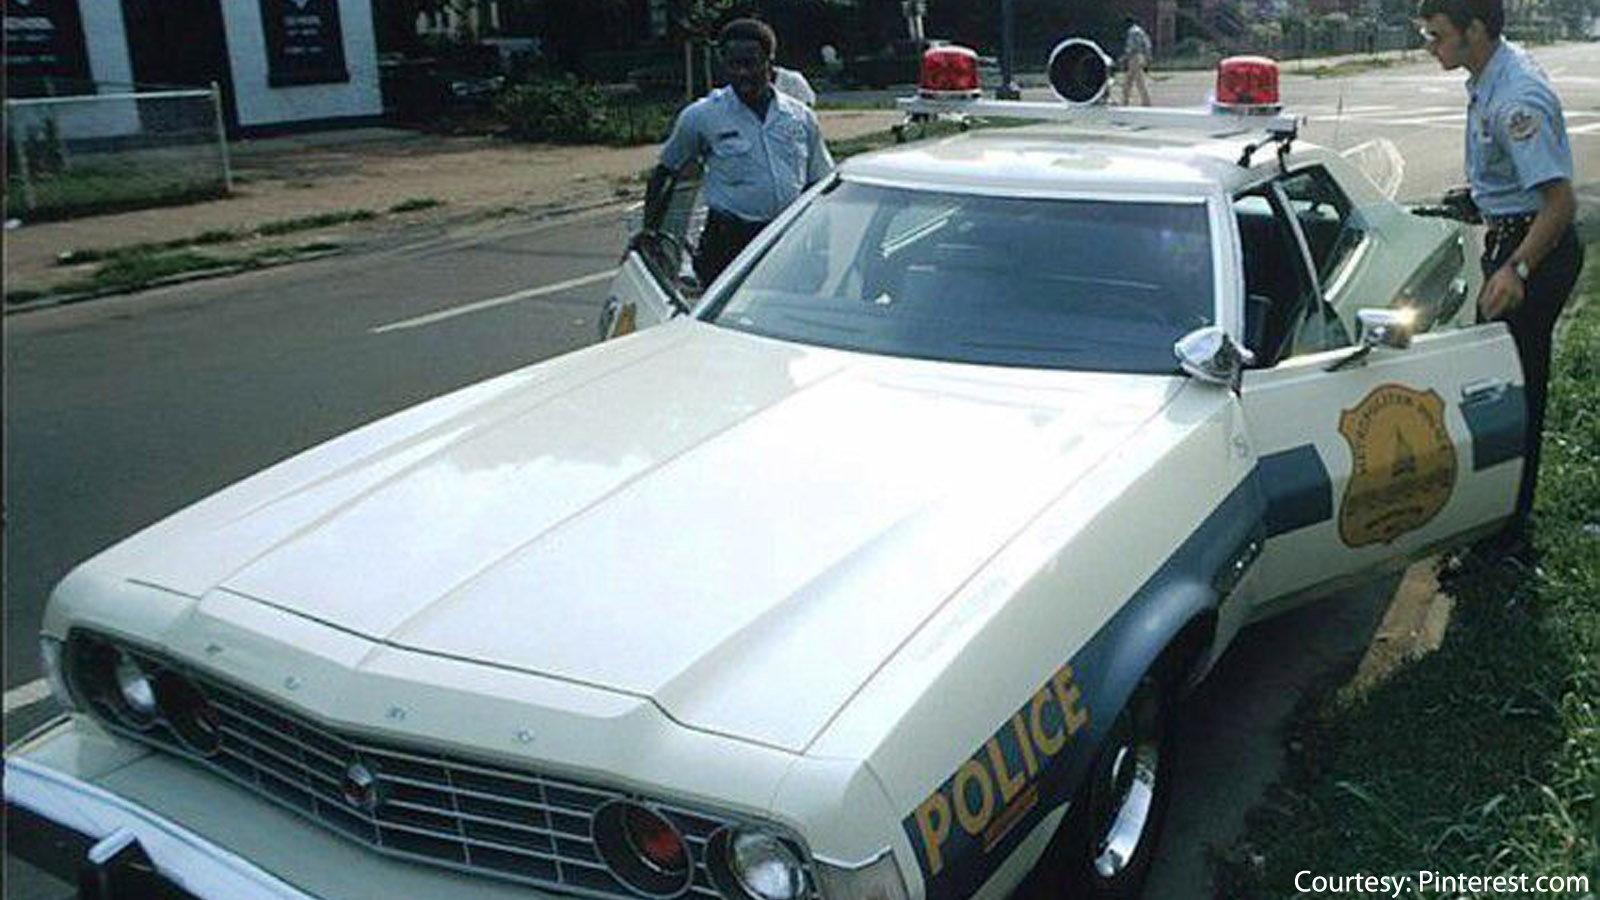 1970's Police Cars